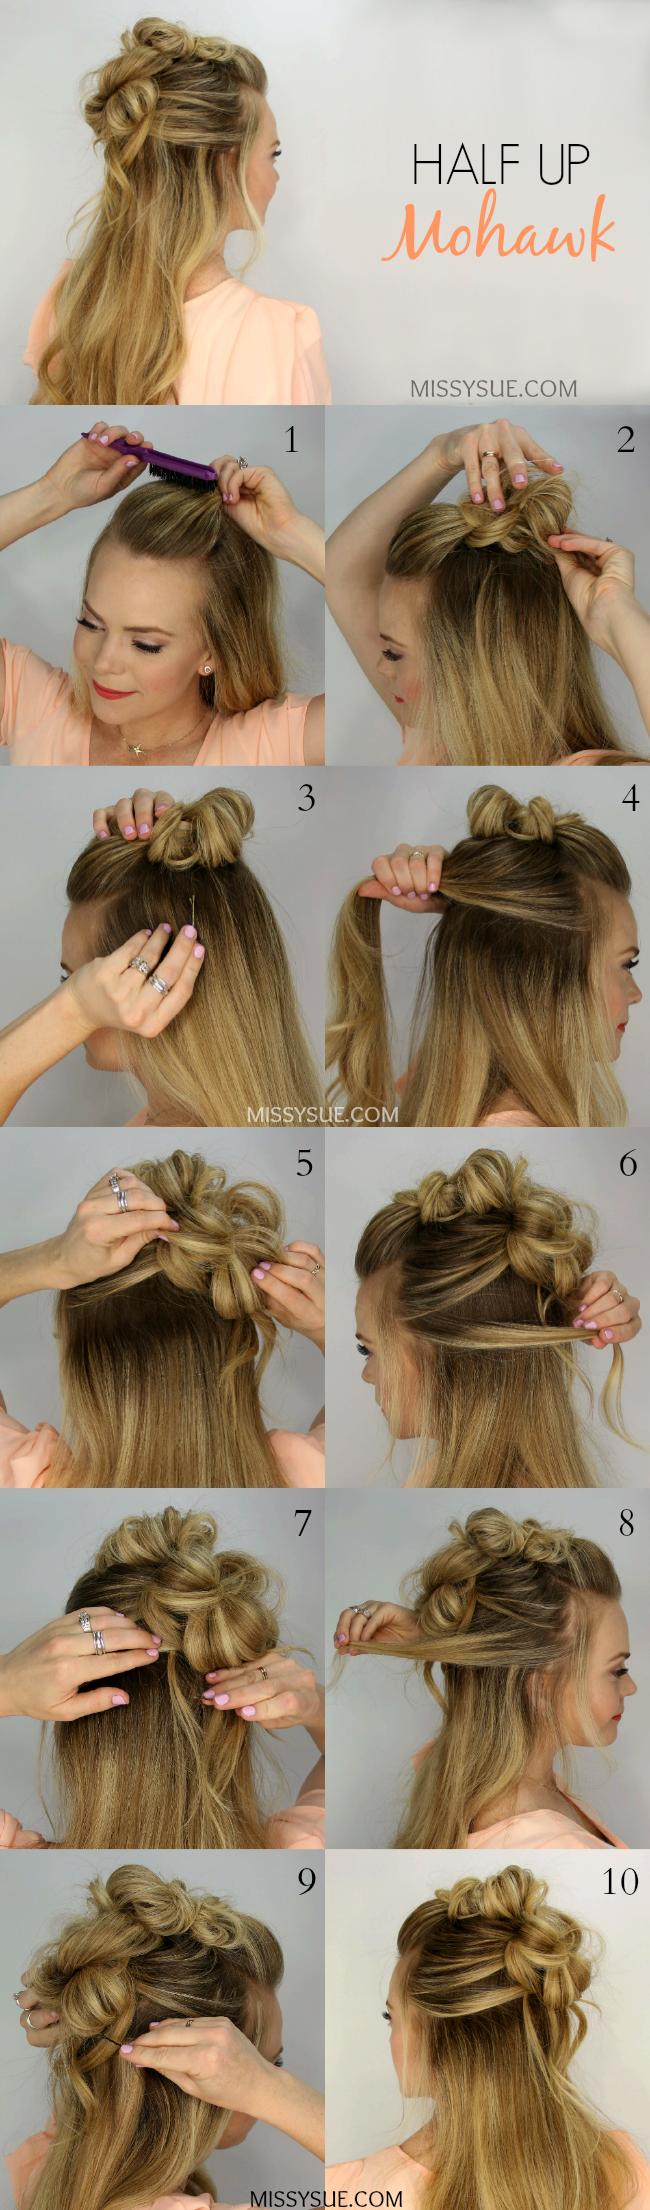 Pin by olivia burns on hair styles pinterest hair hair styles